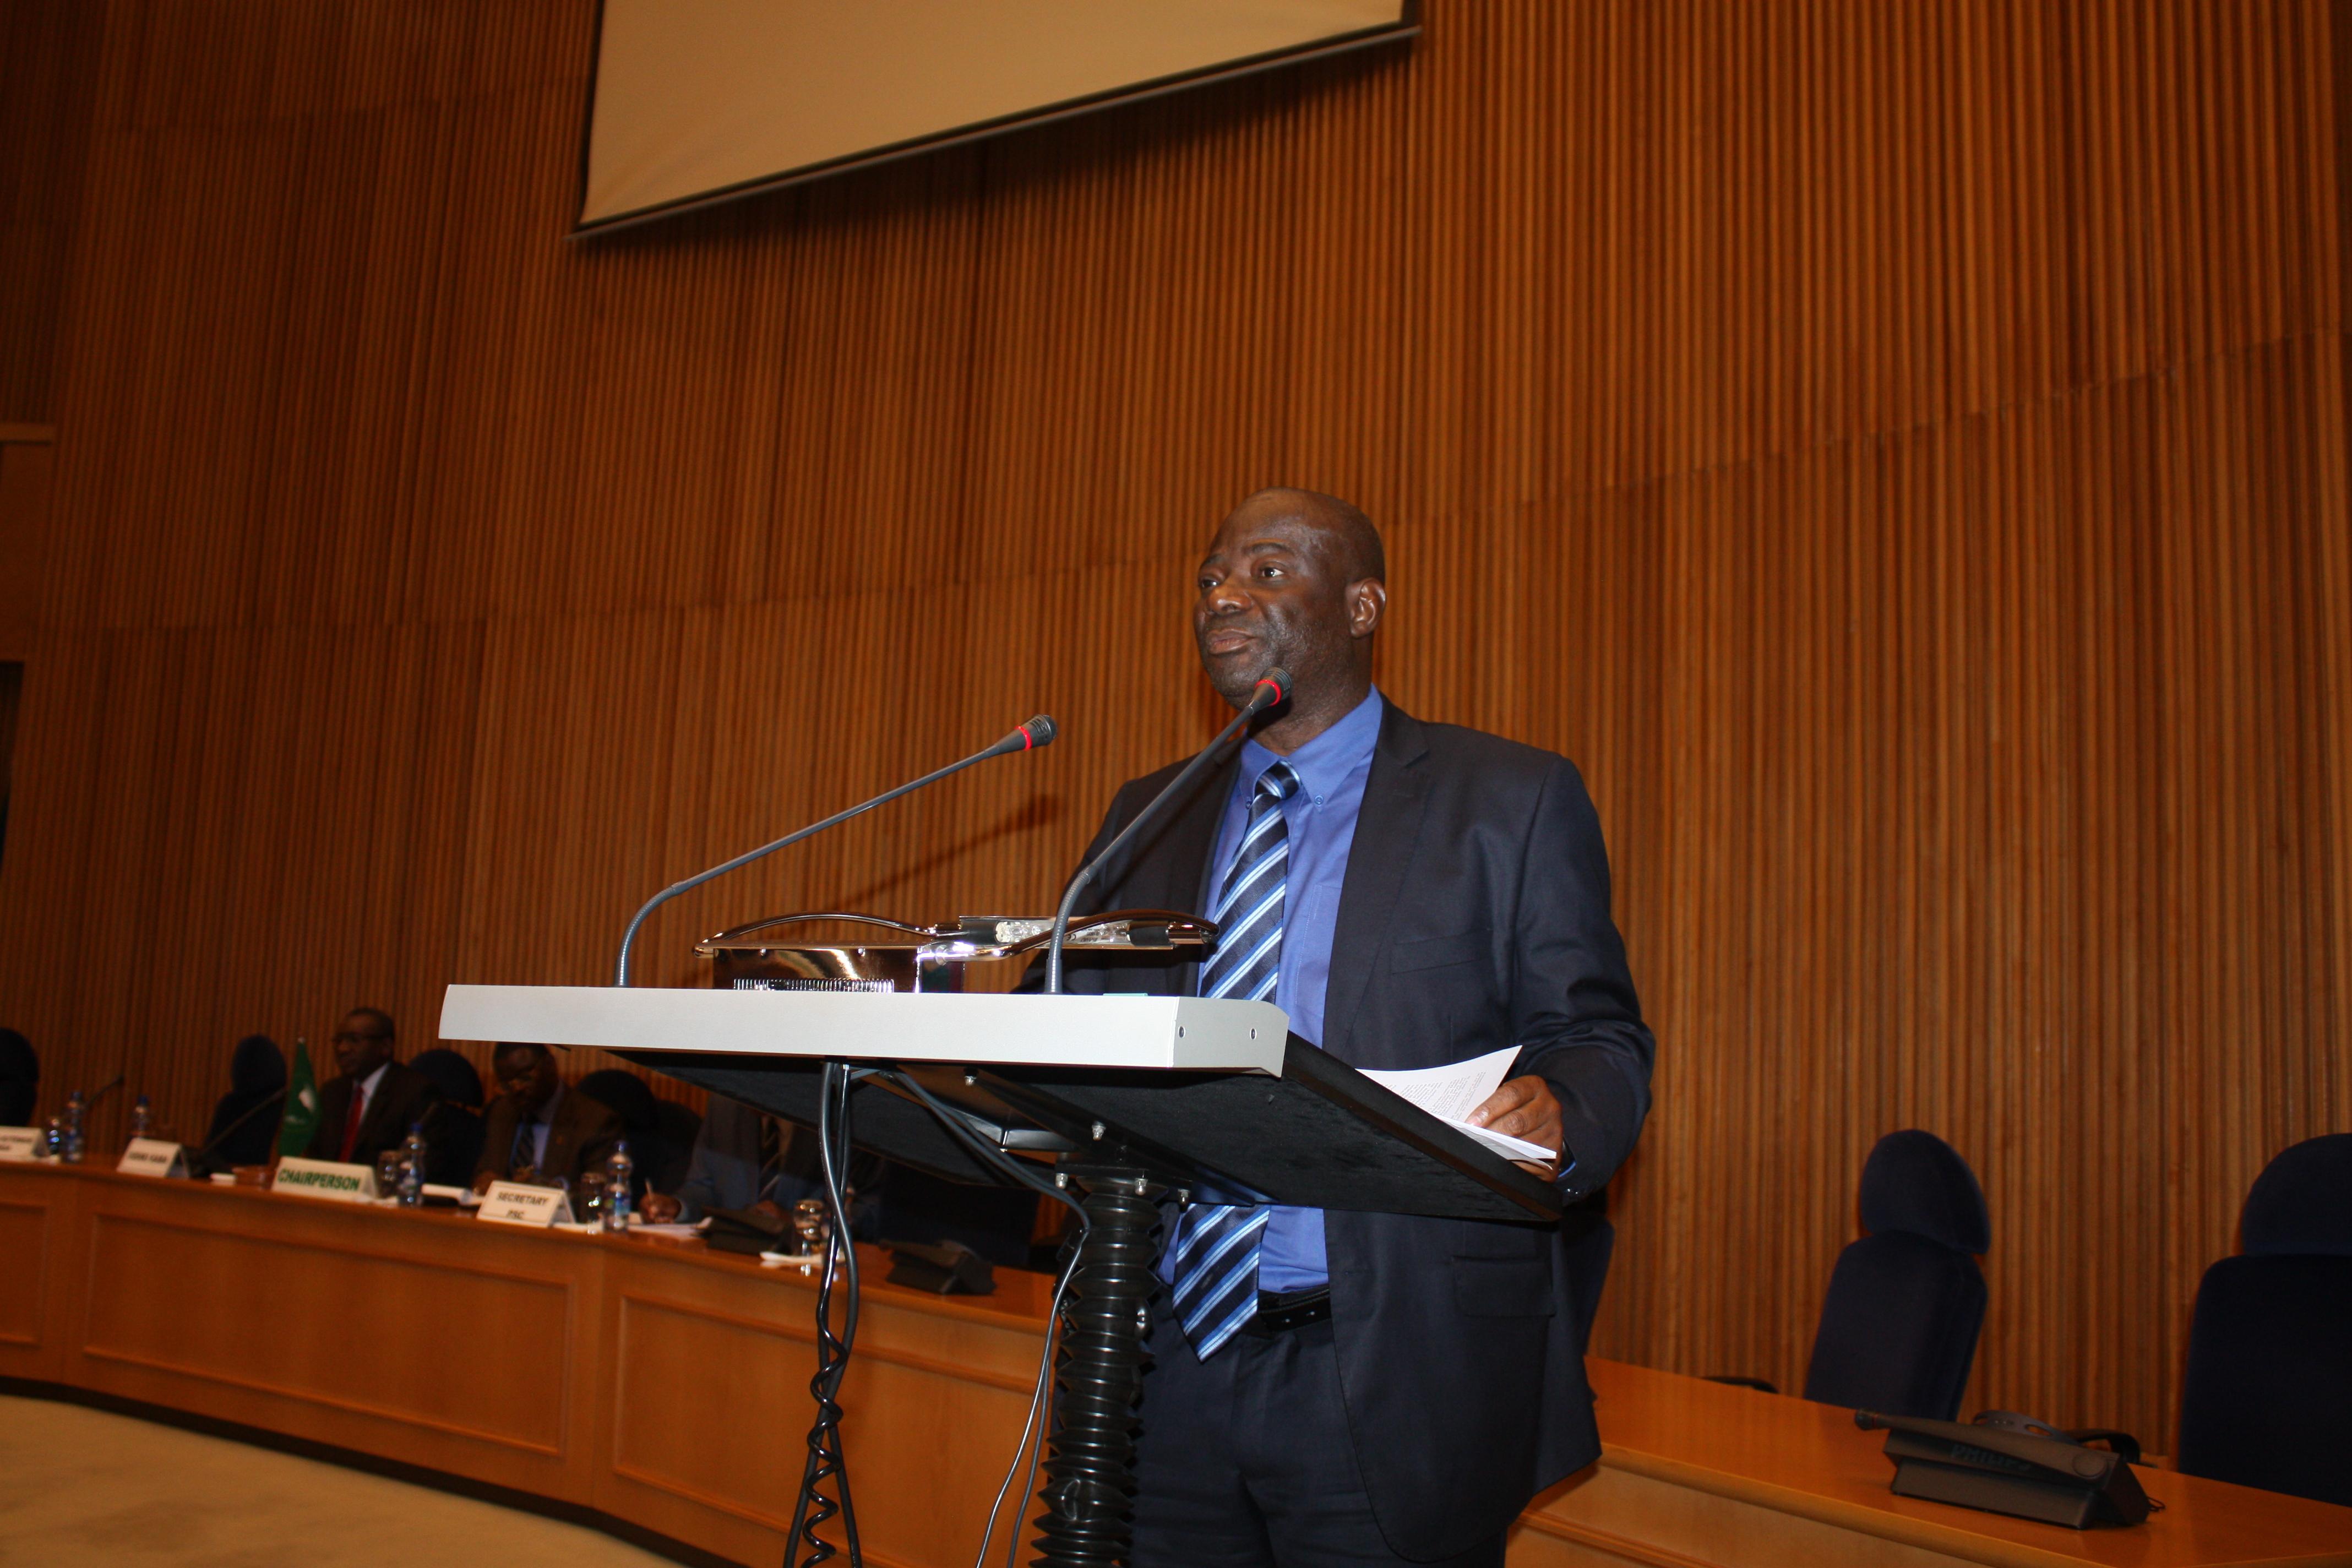 Mr. Dismas Kitenge Senga, Representative of the Malian Association for Human Rights